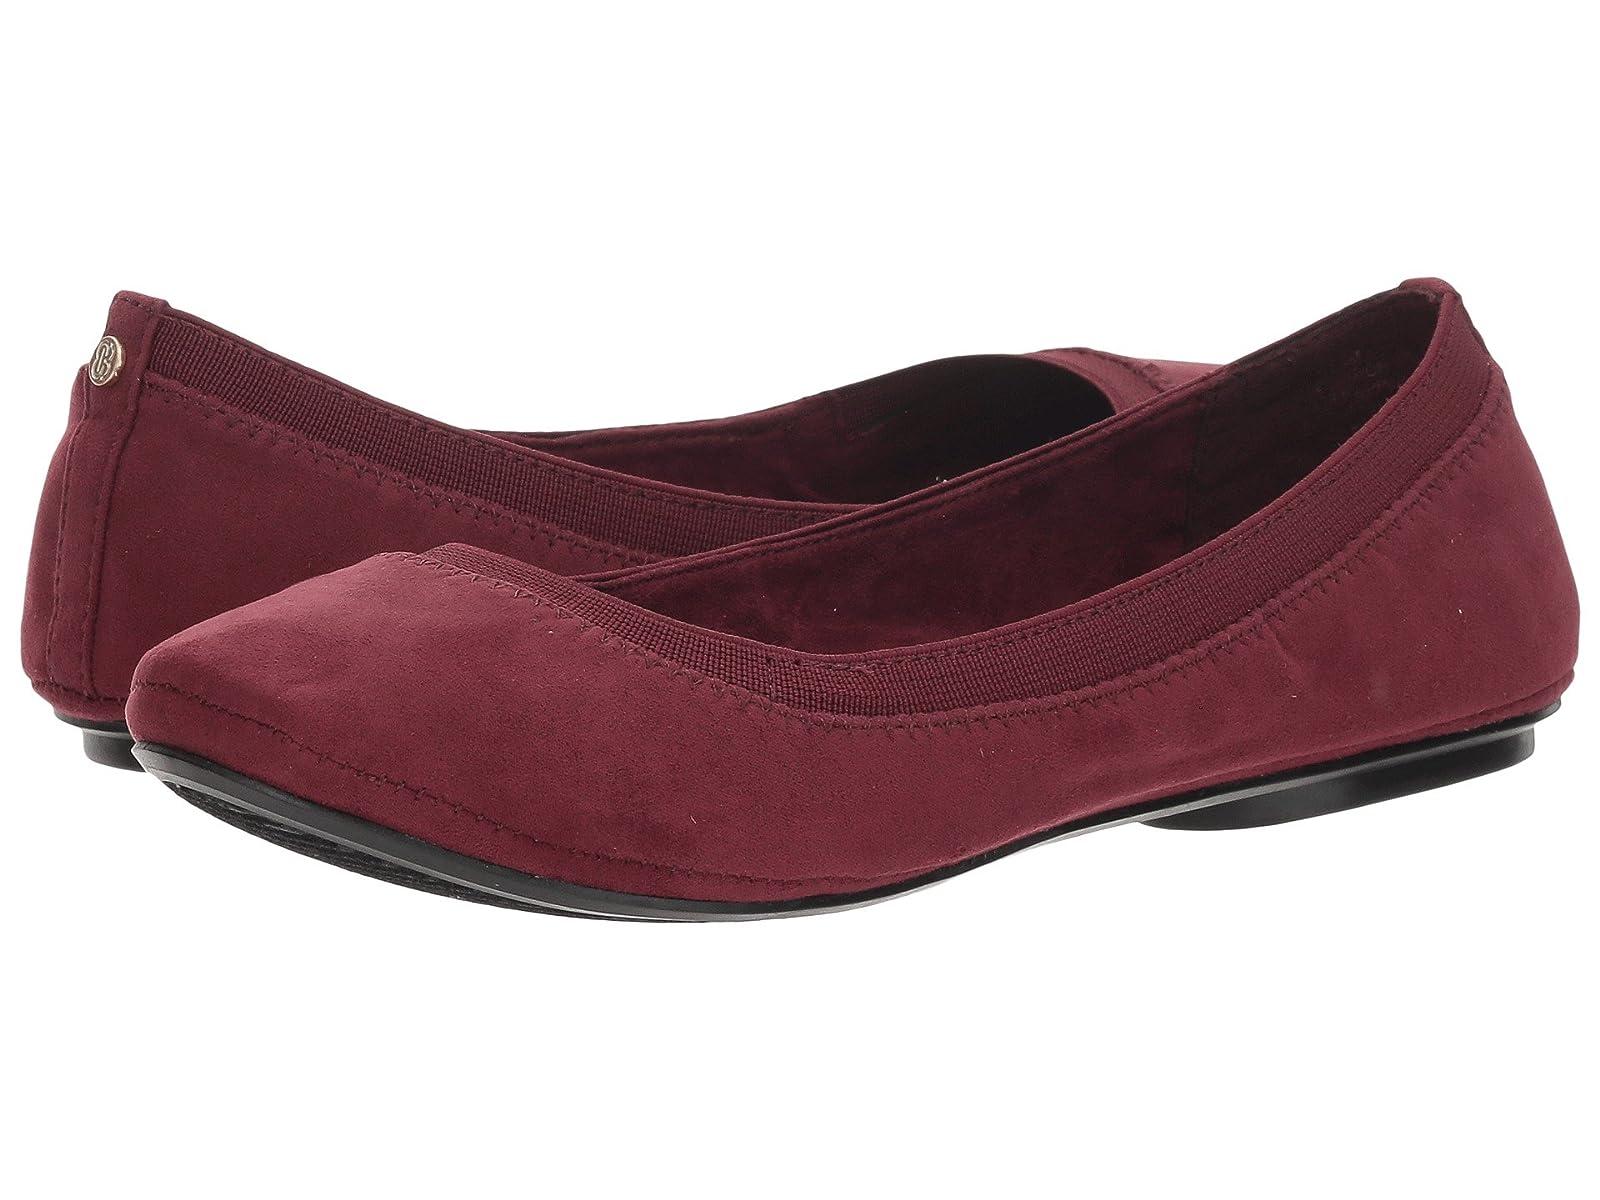 Bandolino EditionAtmospheric grades have affordable shoes